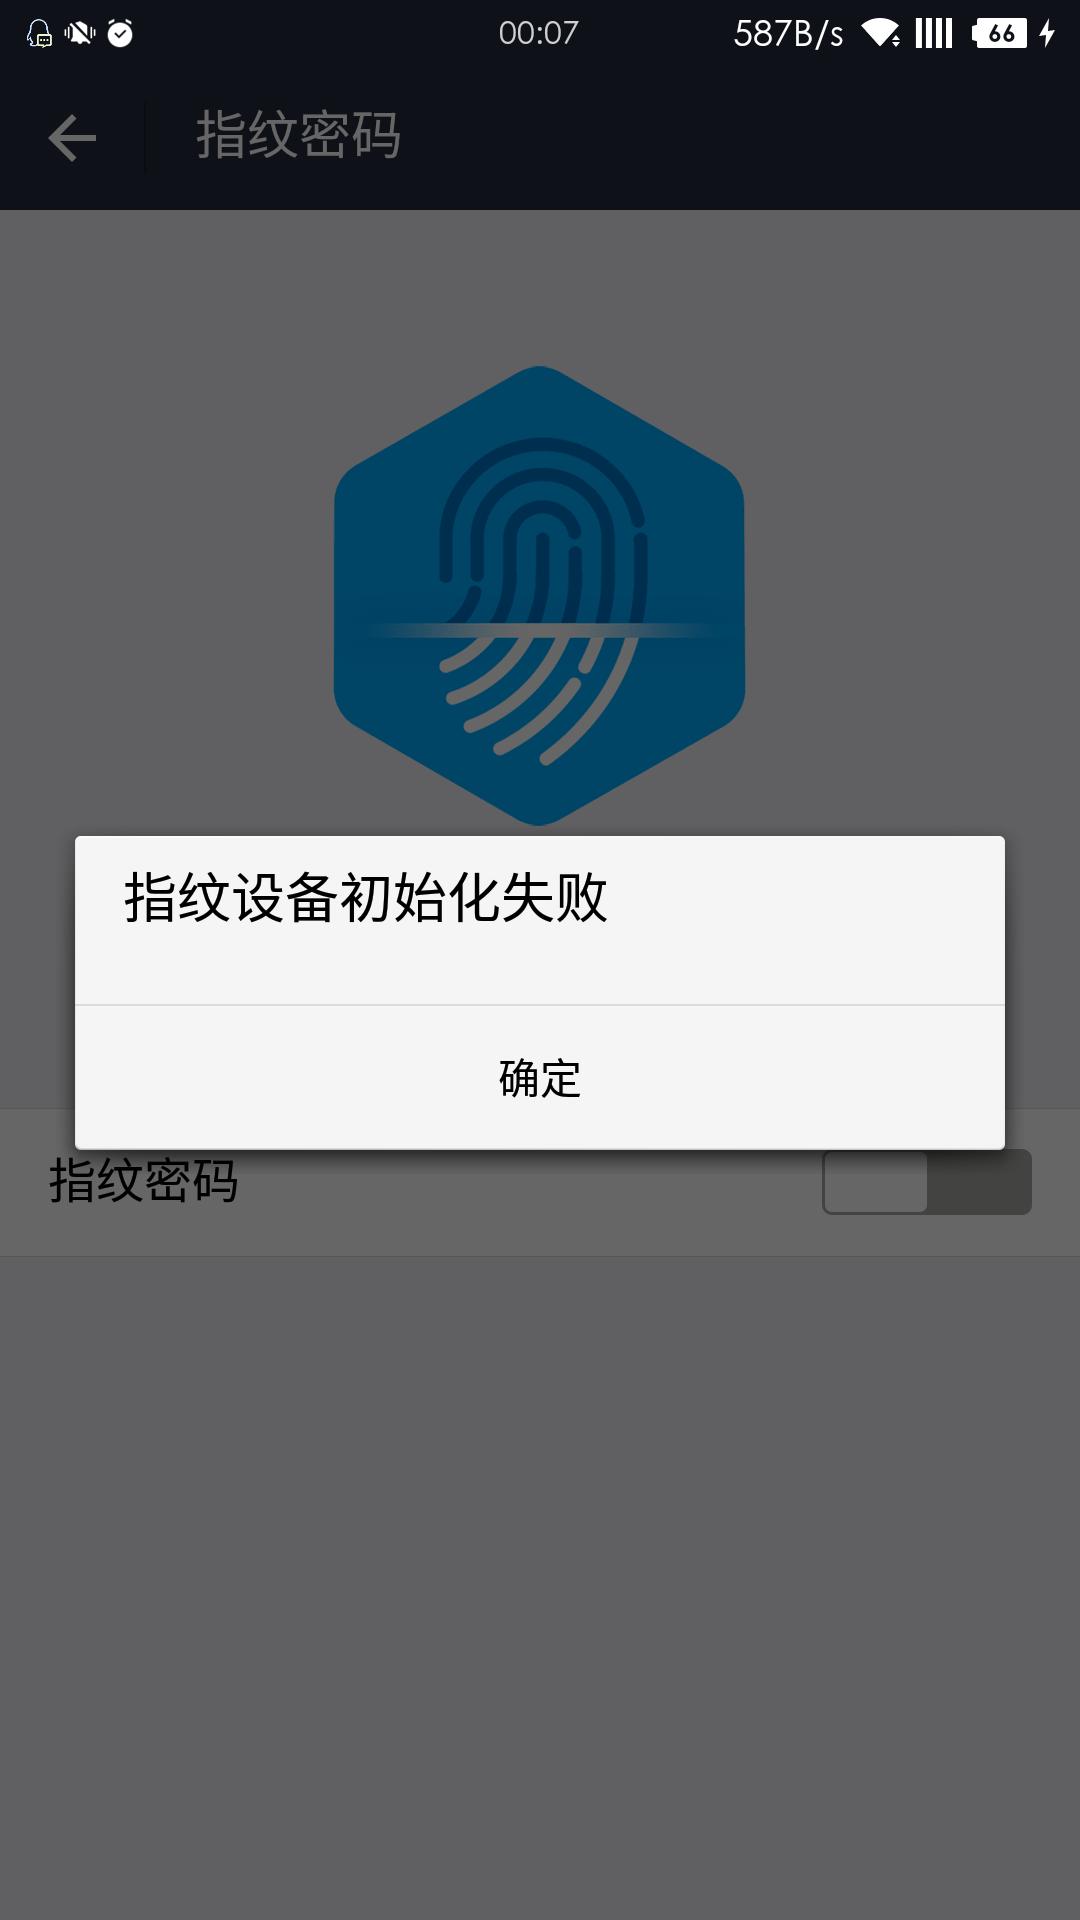 Screenshot_2016-03-01-00-07-29.png